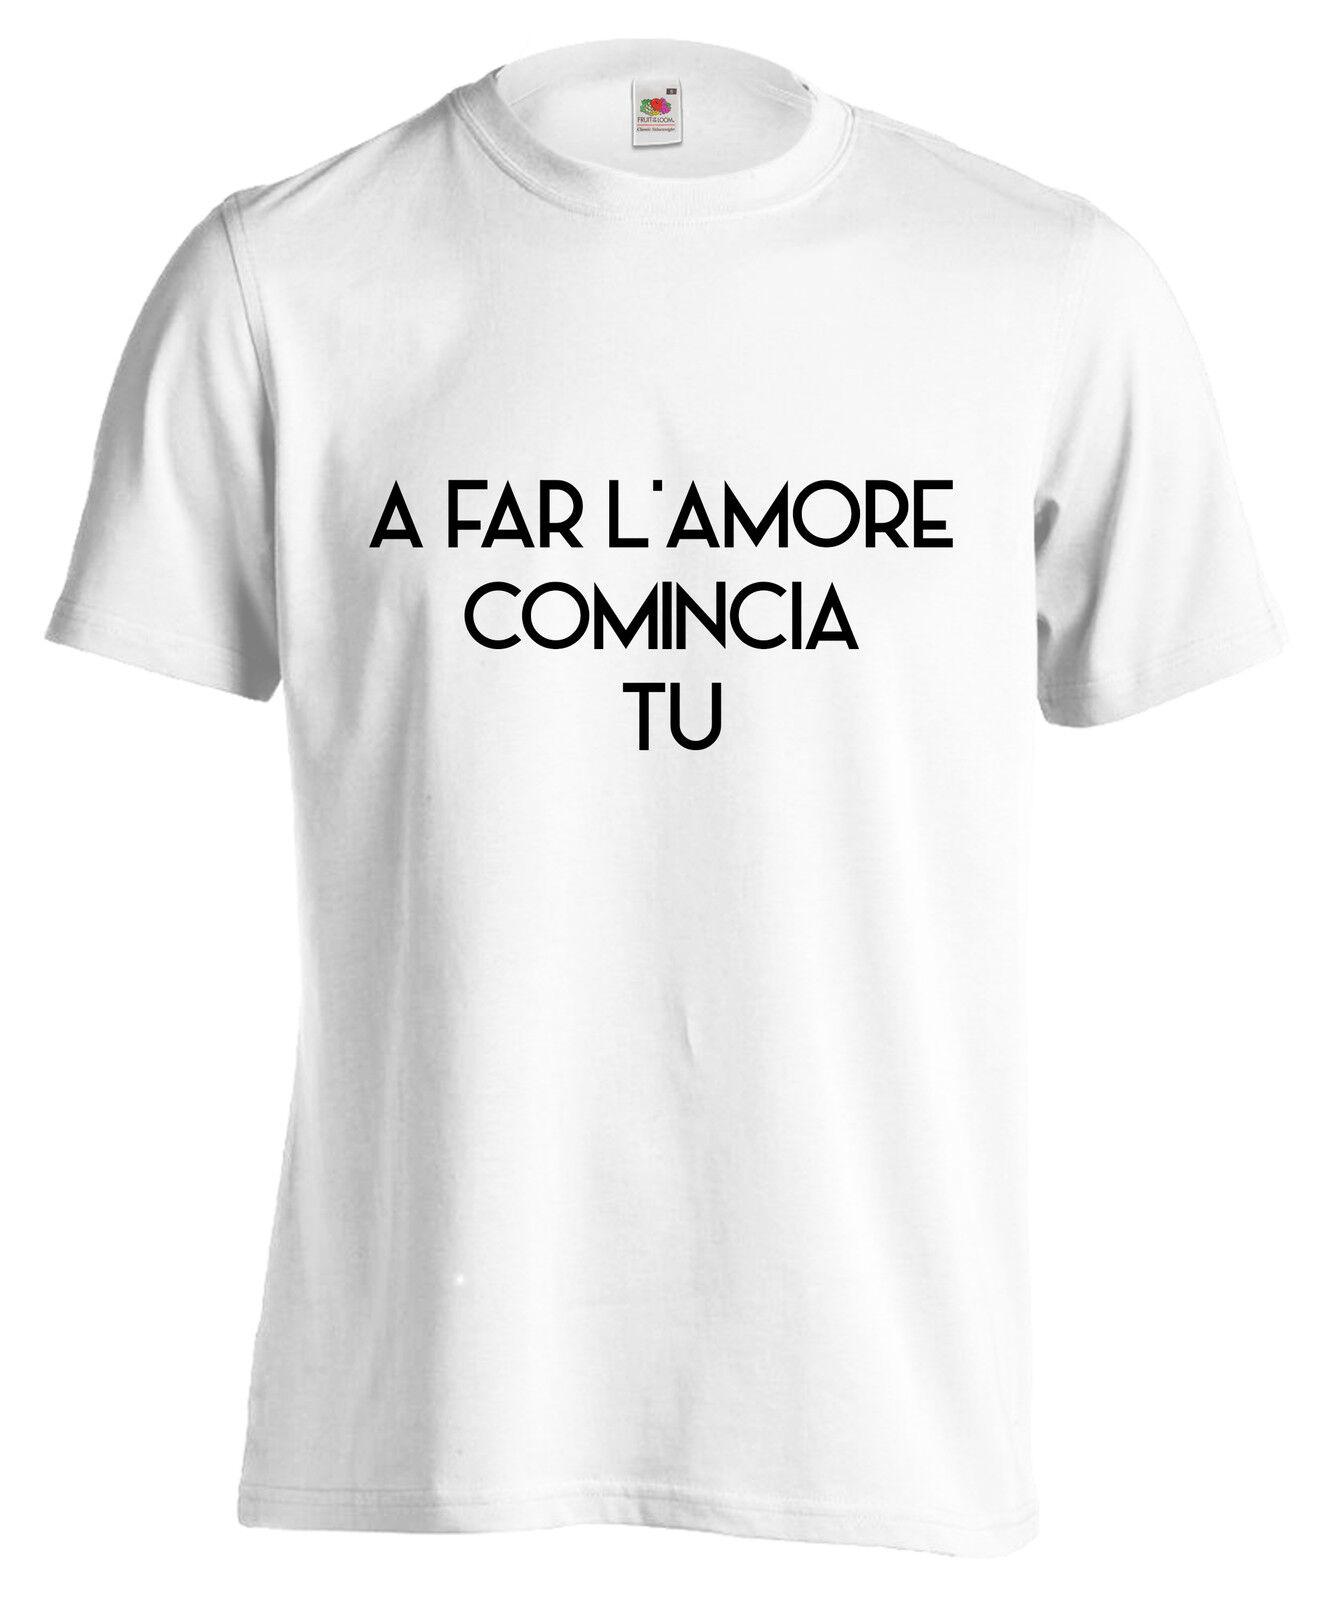 T-SHIRT A FAR 100% L'AMORE COMINCIA TU maglietta 100% FAR cotone trendy carrà cool moda 0b6507